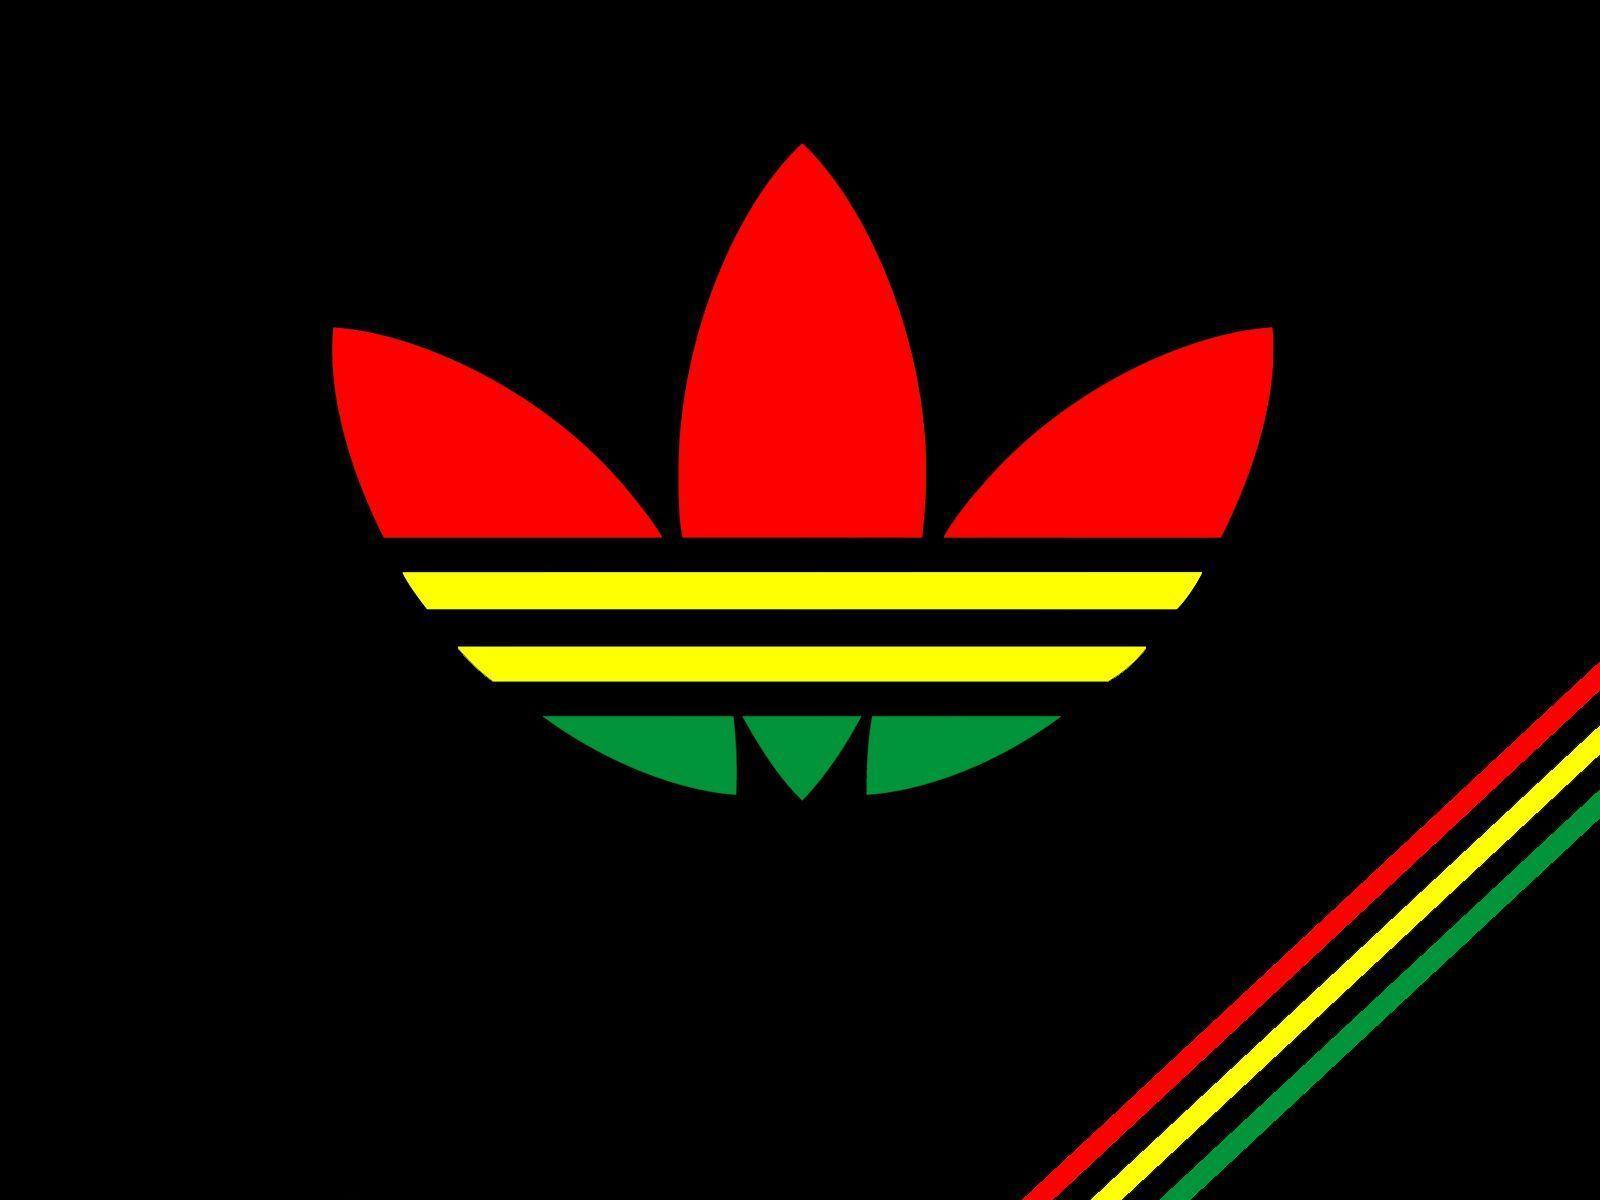 Adidas Originals Logo Wallpapers 1600x1200